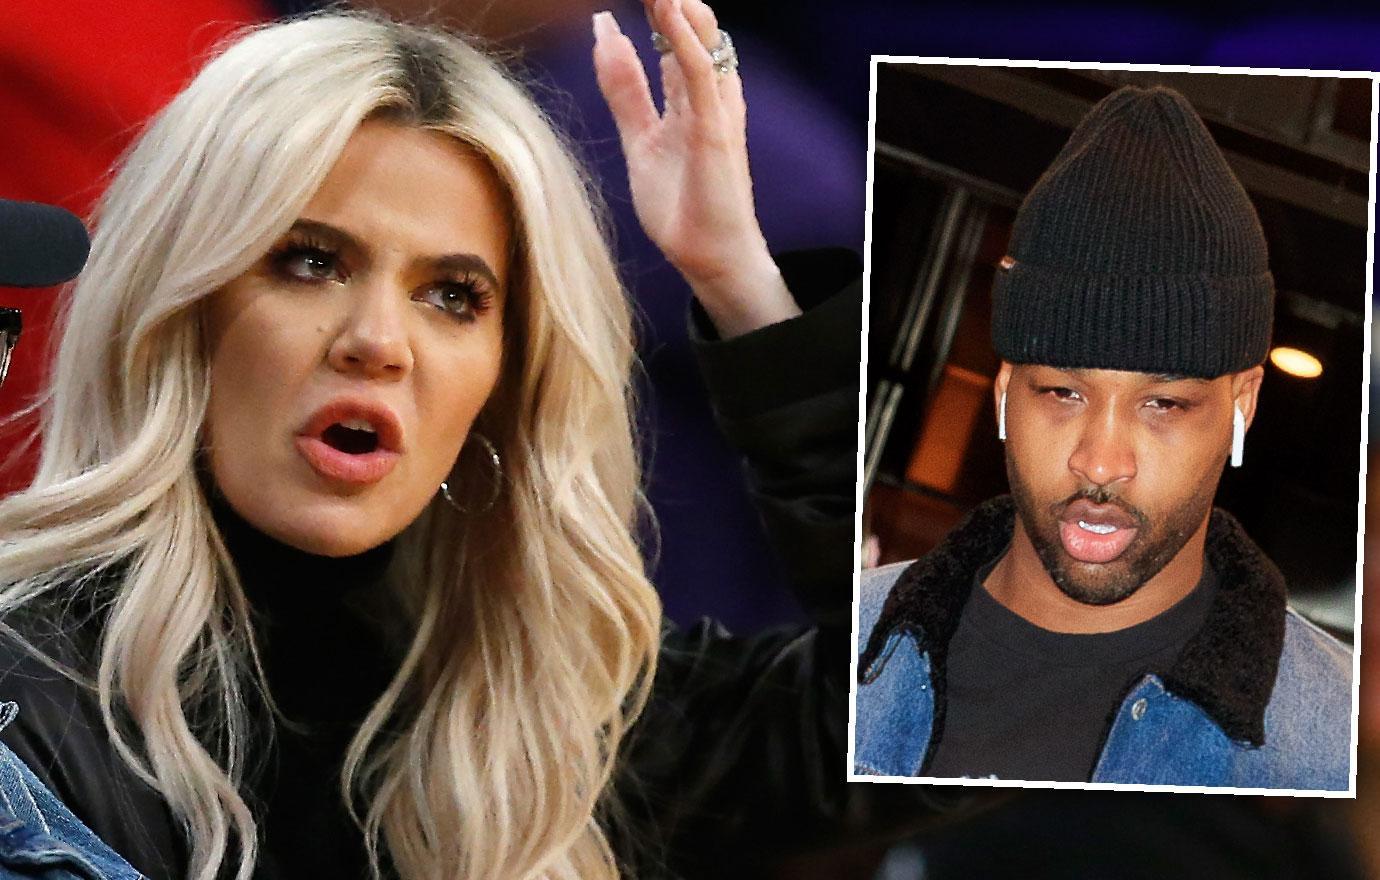 Khloe Kardashian Blames Tristan For Breaking Up Family